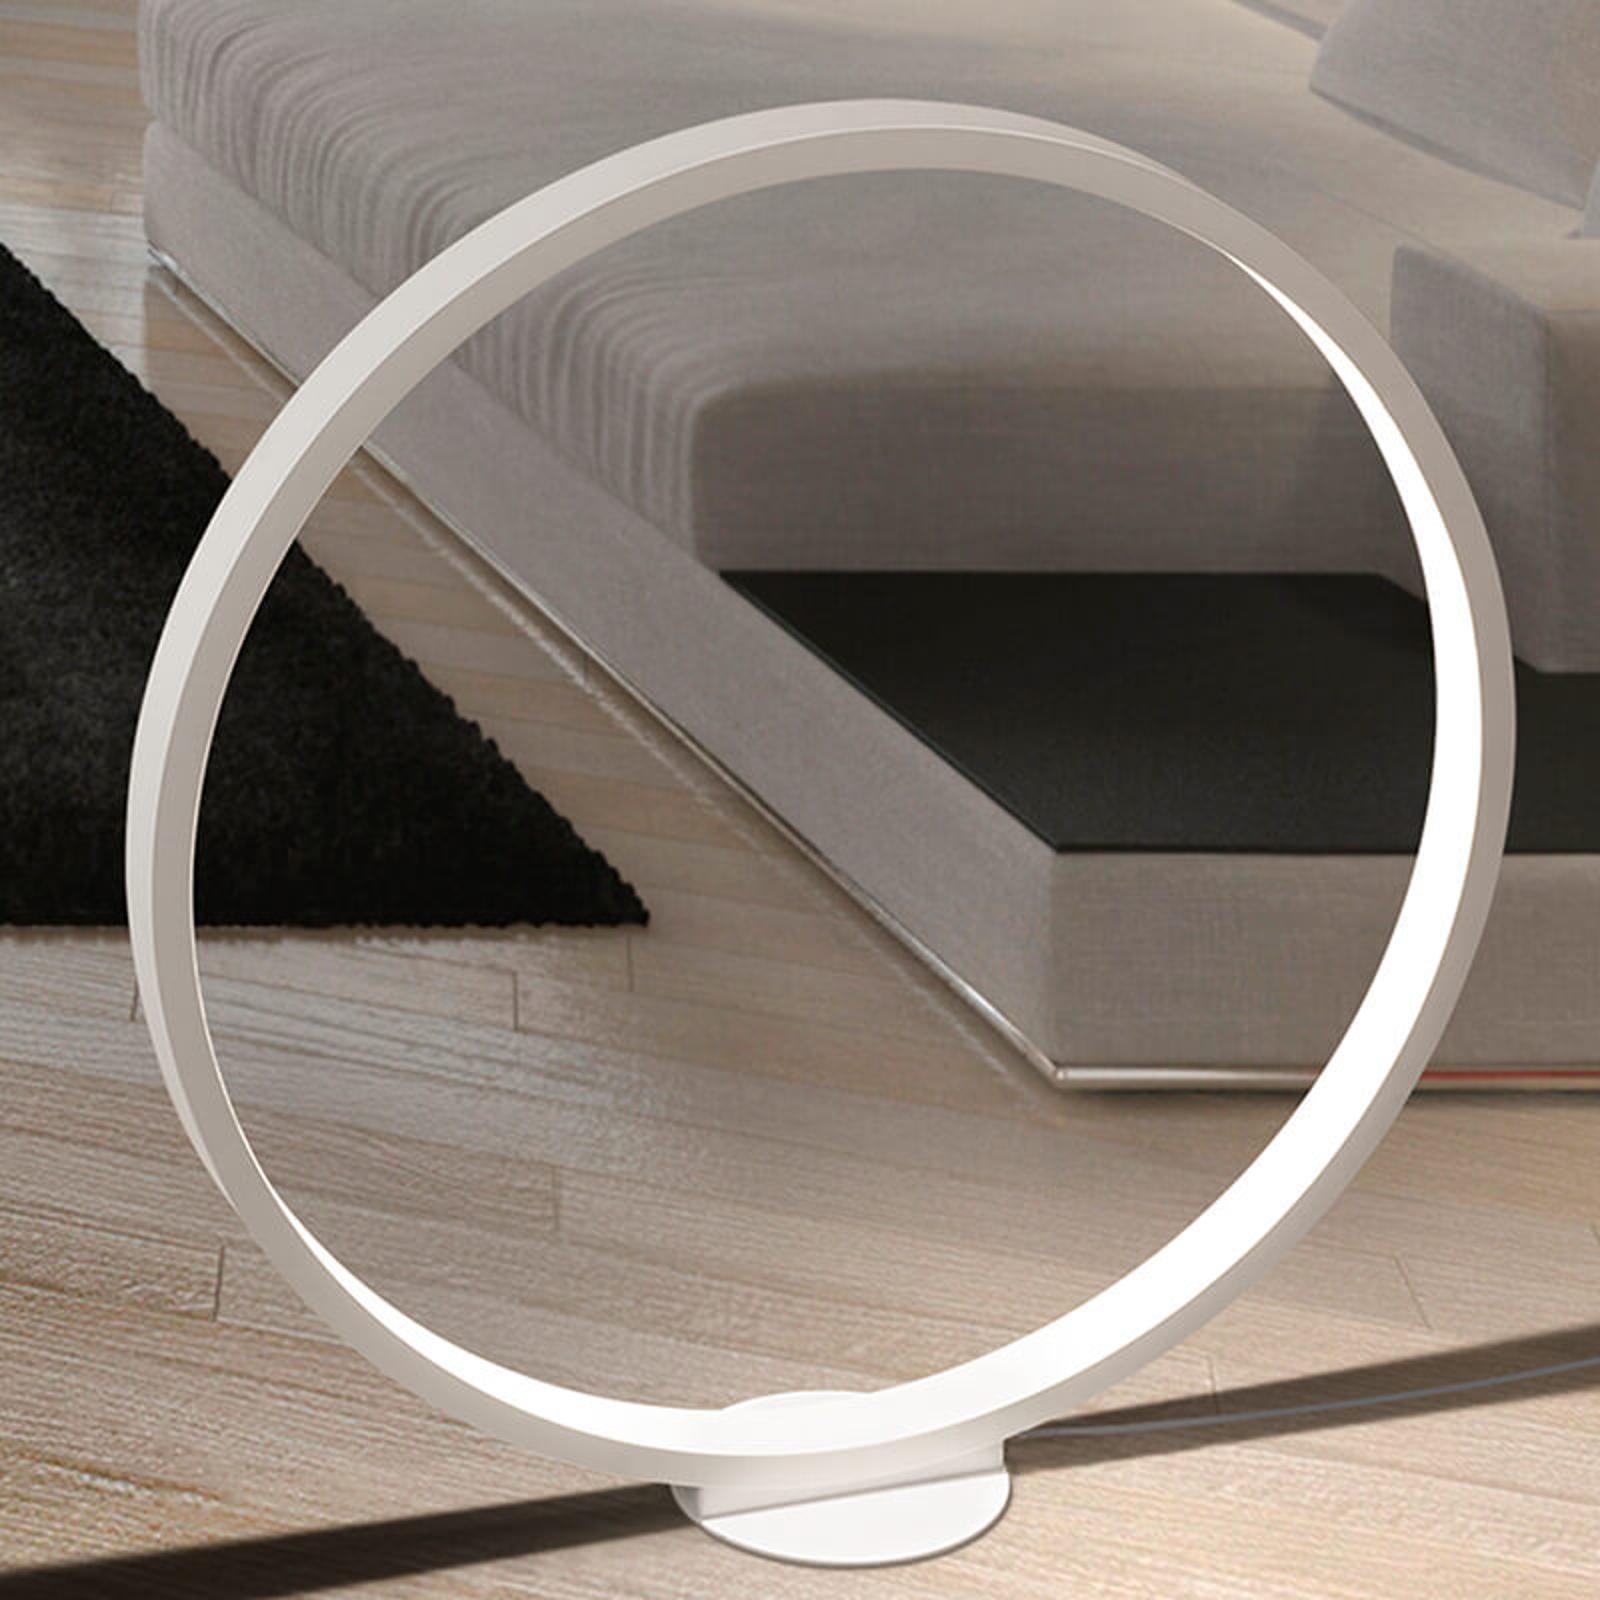 Cini&Nils Assolo weiße LED-Bodenleuchte m. Dimmer